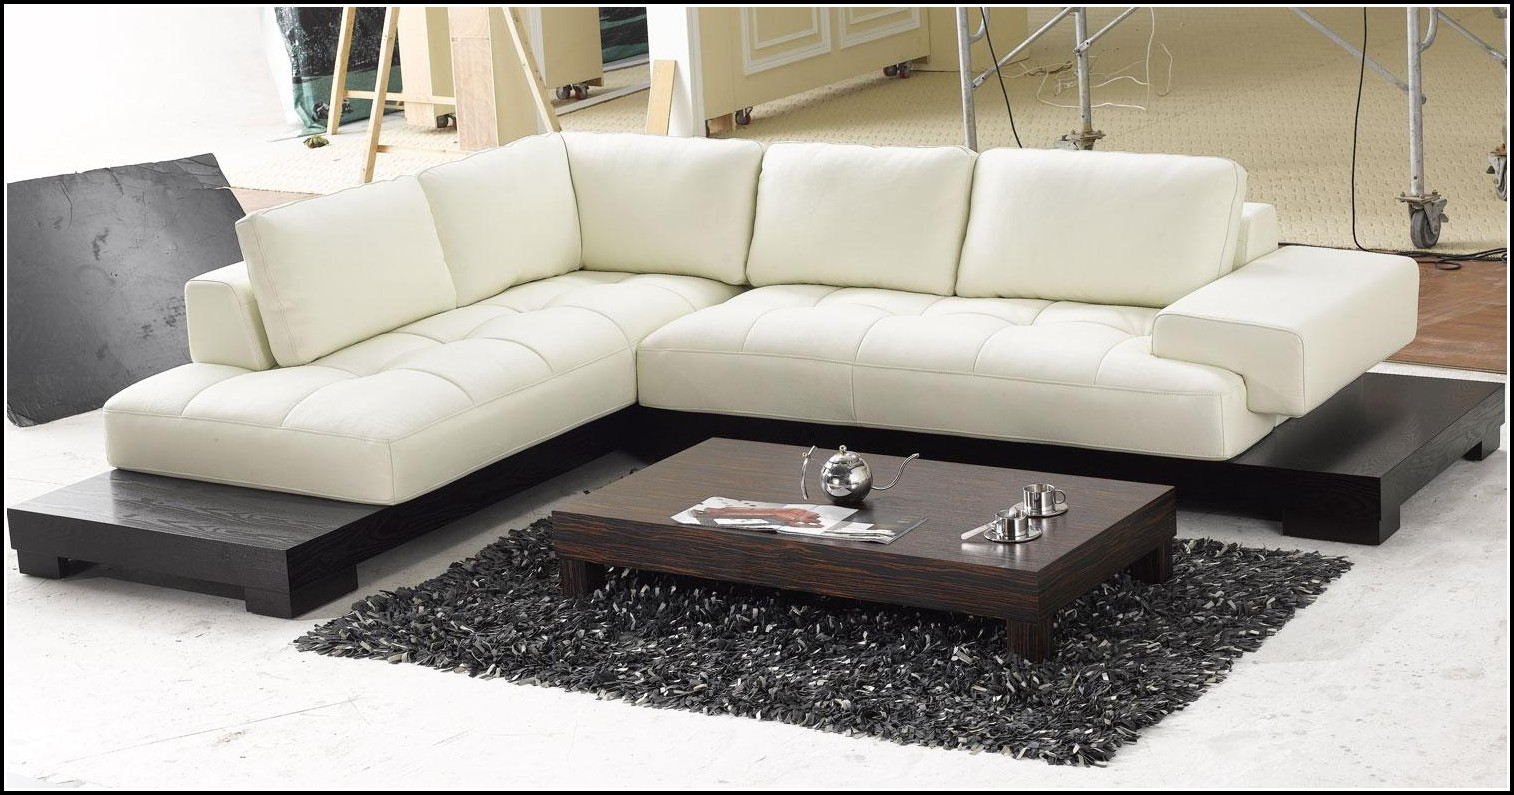 Design Sofa Leder Schwarz